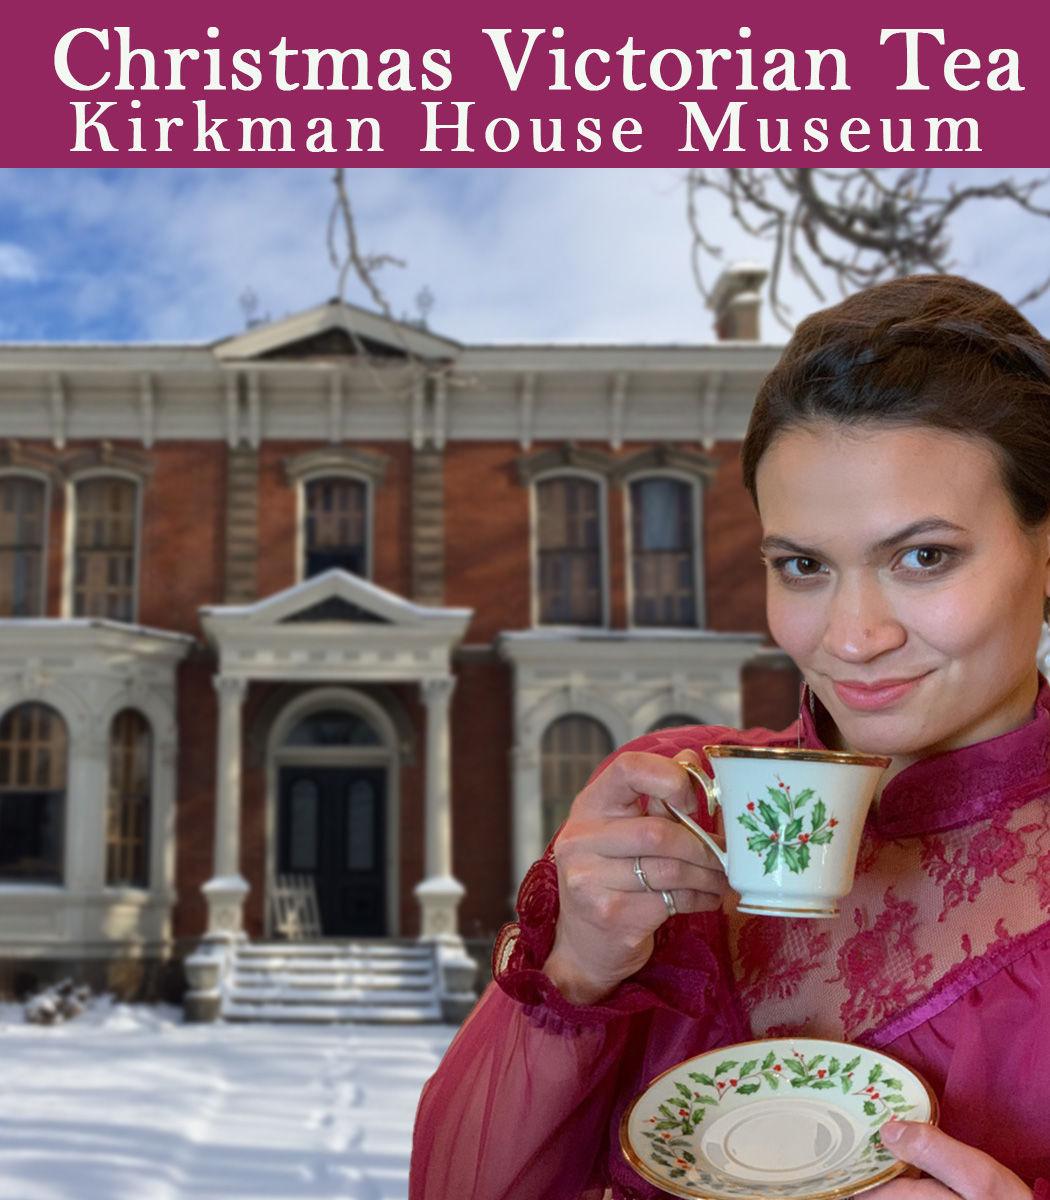 Fancy Tea at the Kirkman House